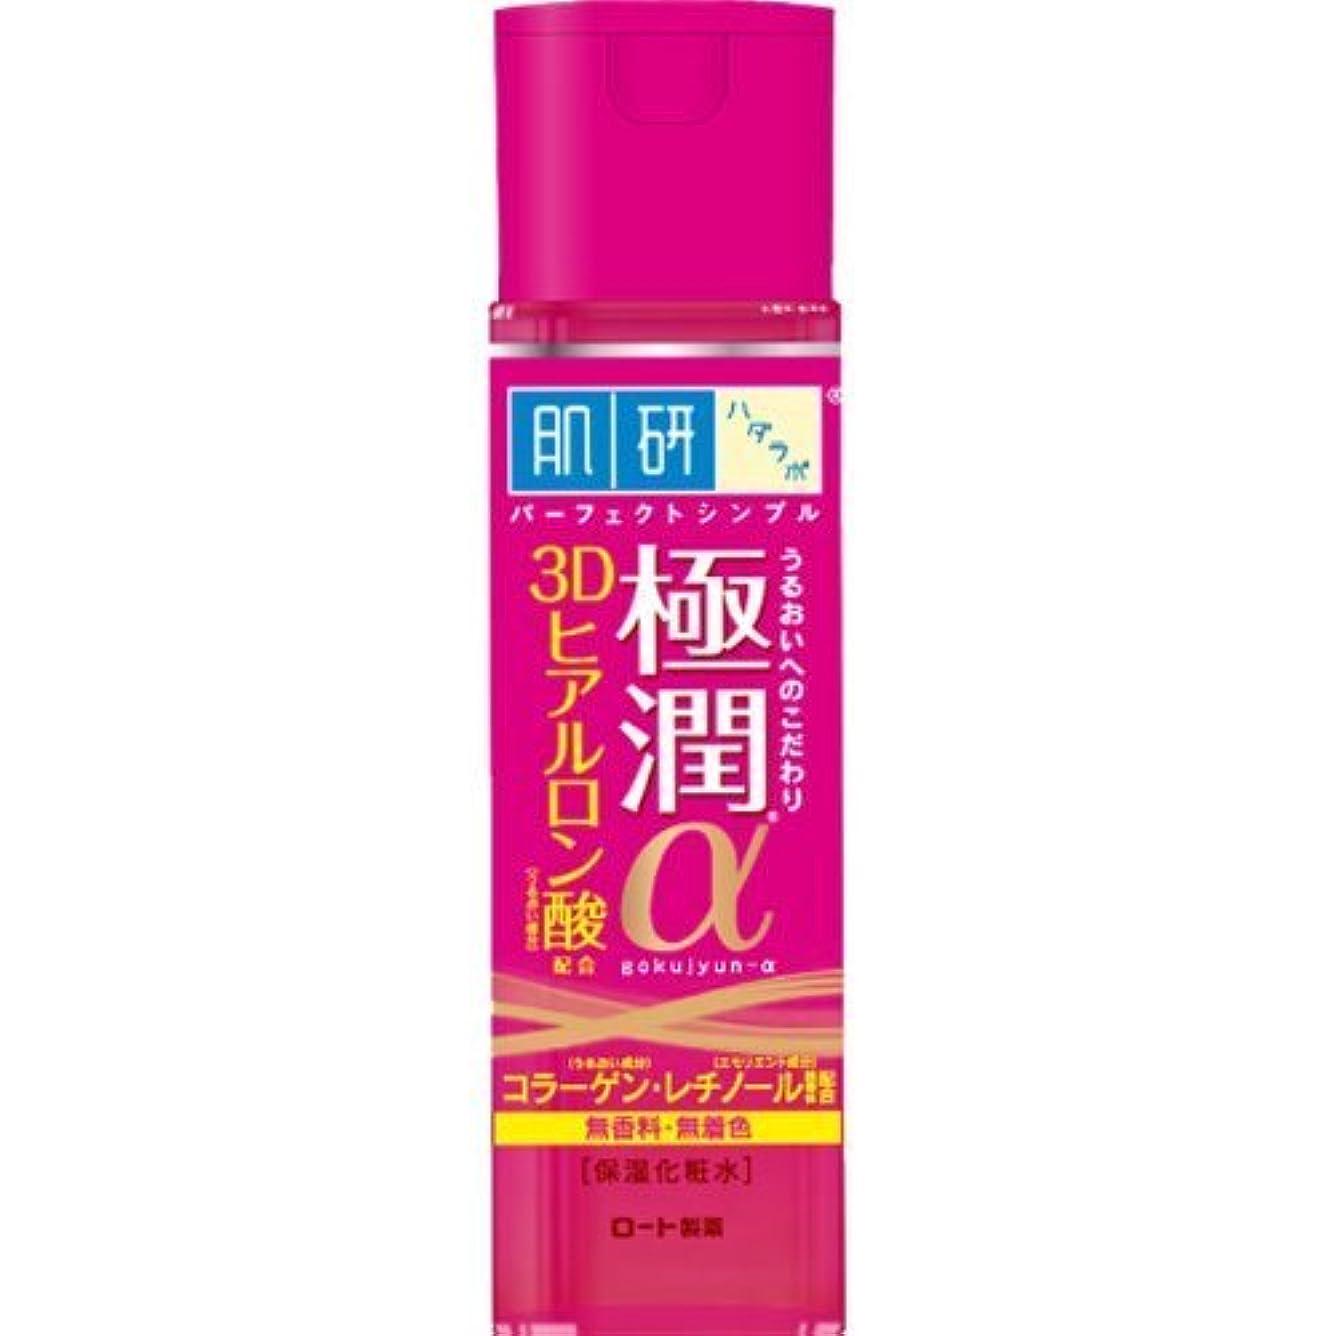 虎優勢乱気流肌研(ハダラボ) 極潤α化粧水 170mL